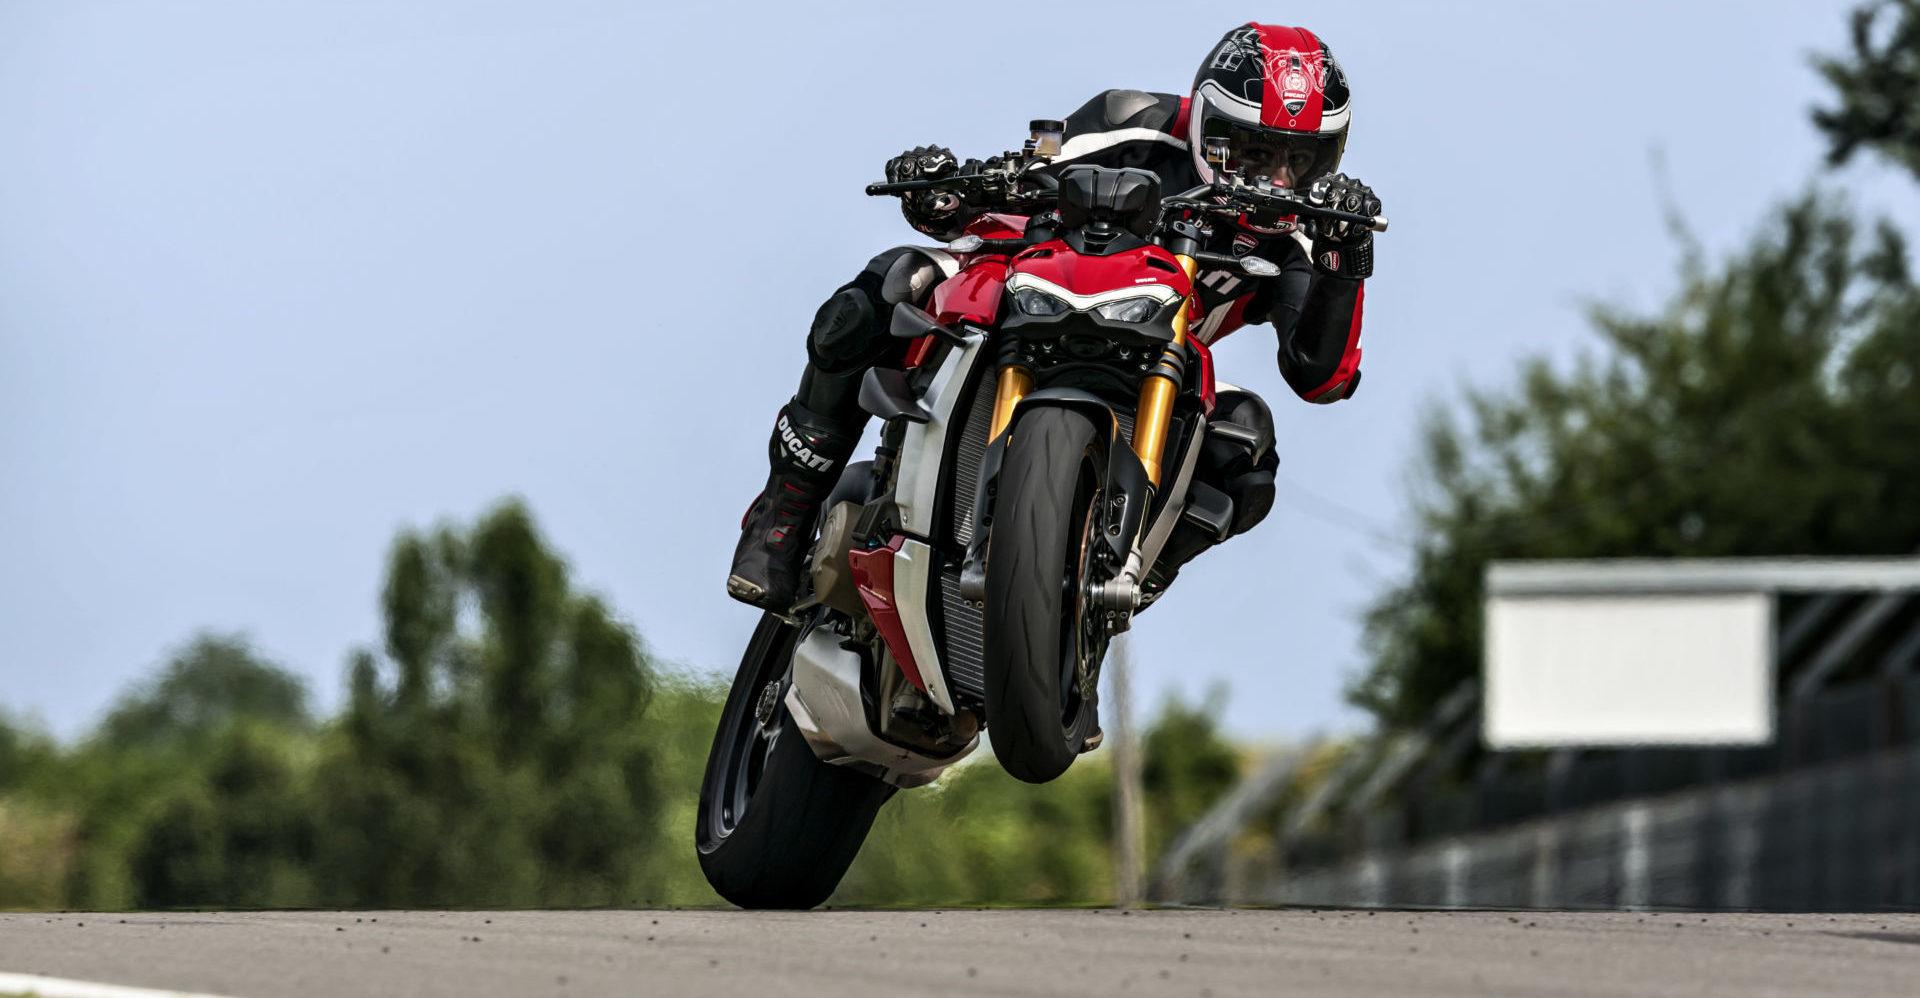 A 2020 Ducati Streetfighter V4 S. Photo courtesy of Ducati.